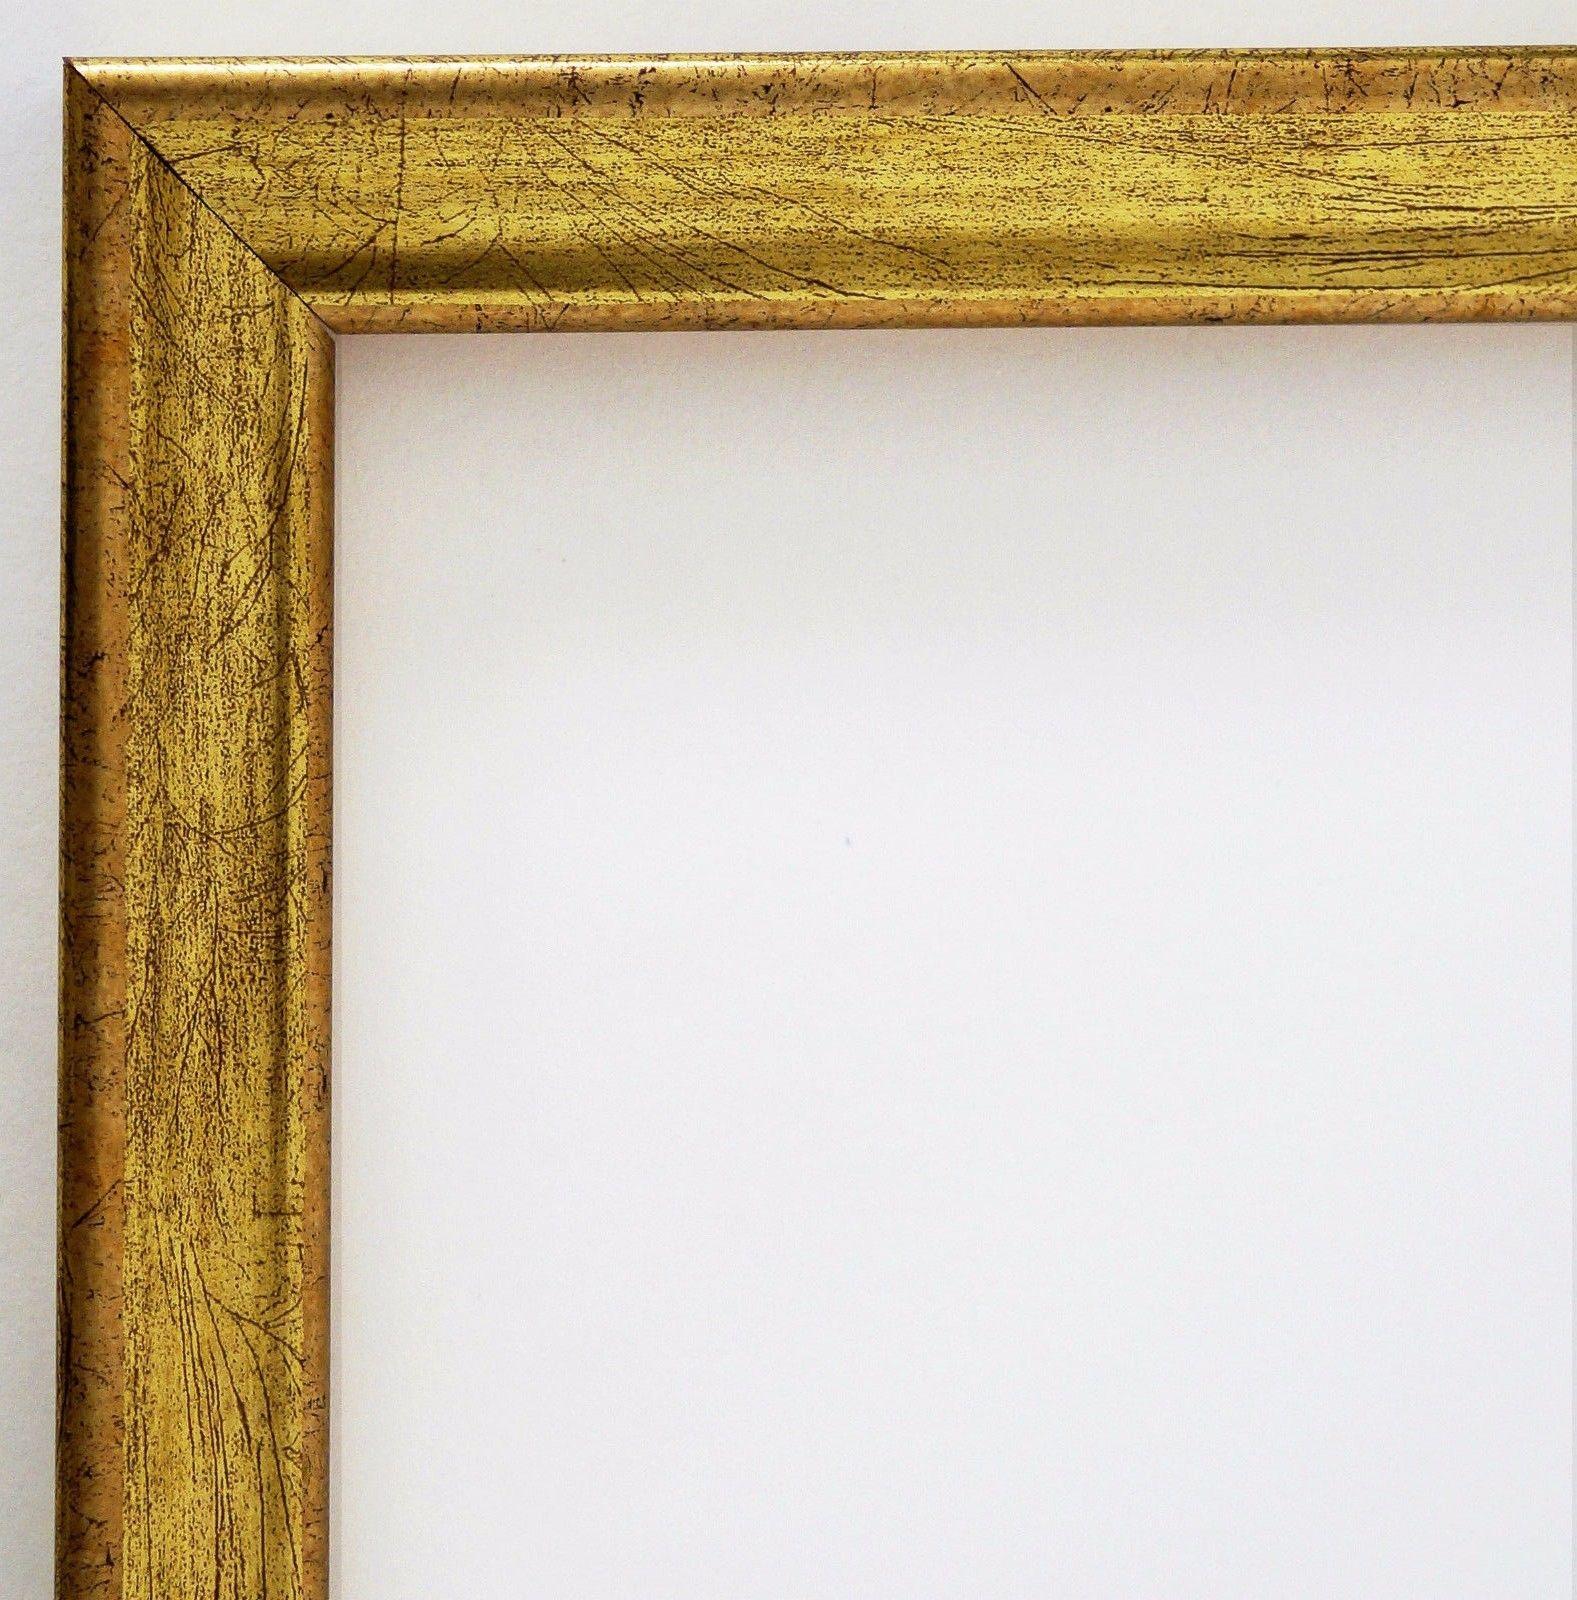 Bilderrahmen Gold Modern Antik Rahmen Holz Foto Shabby Kiel 2, 3 ...